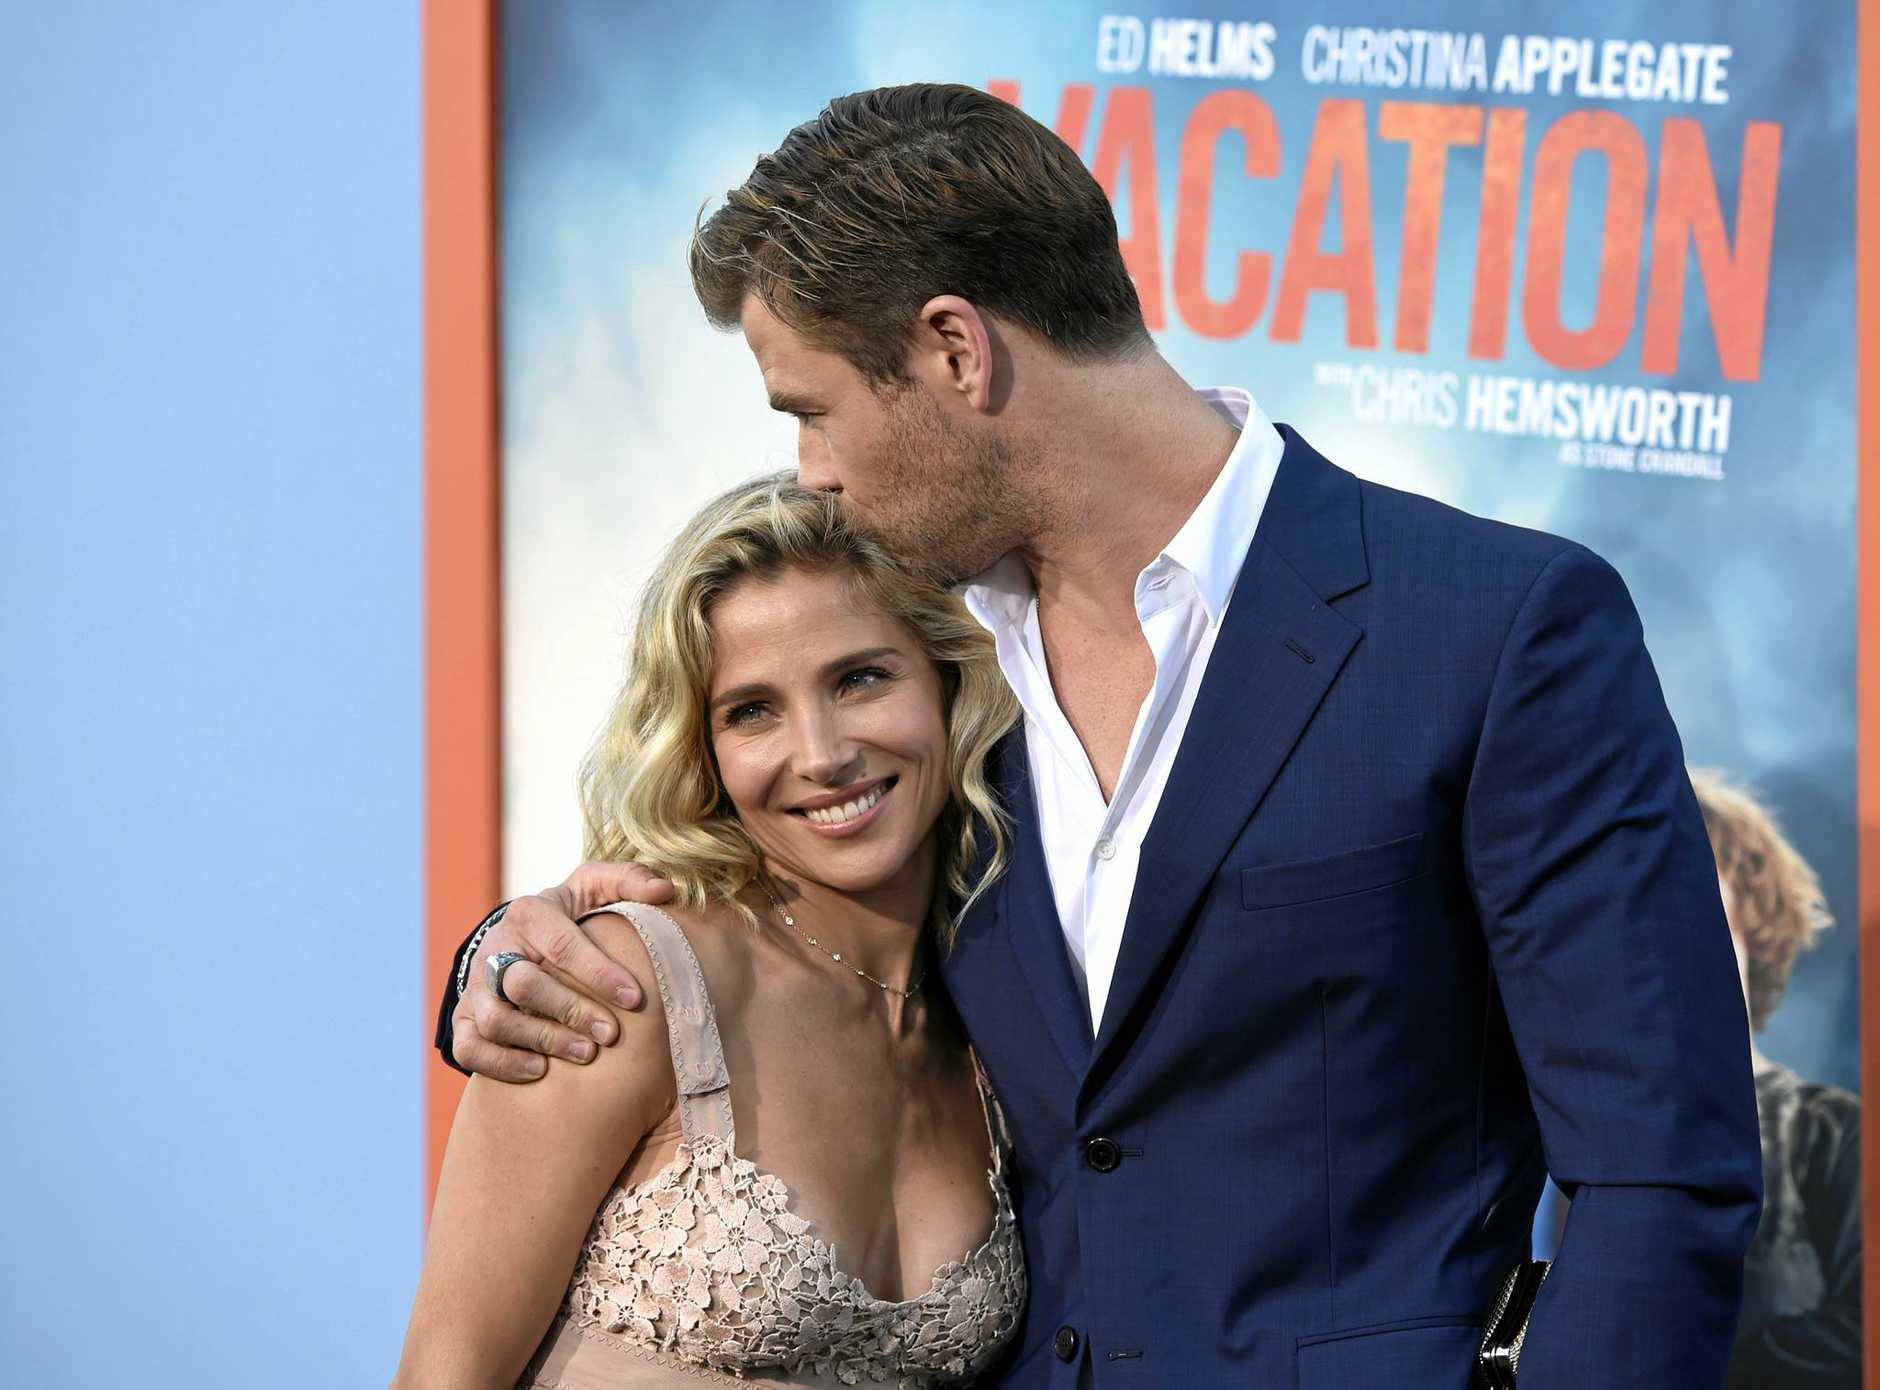 Elsa Pataky and husband Chris Hemsworth